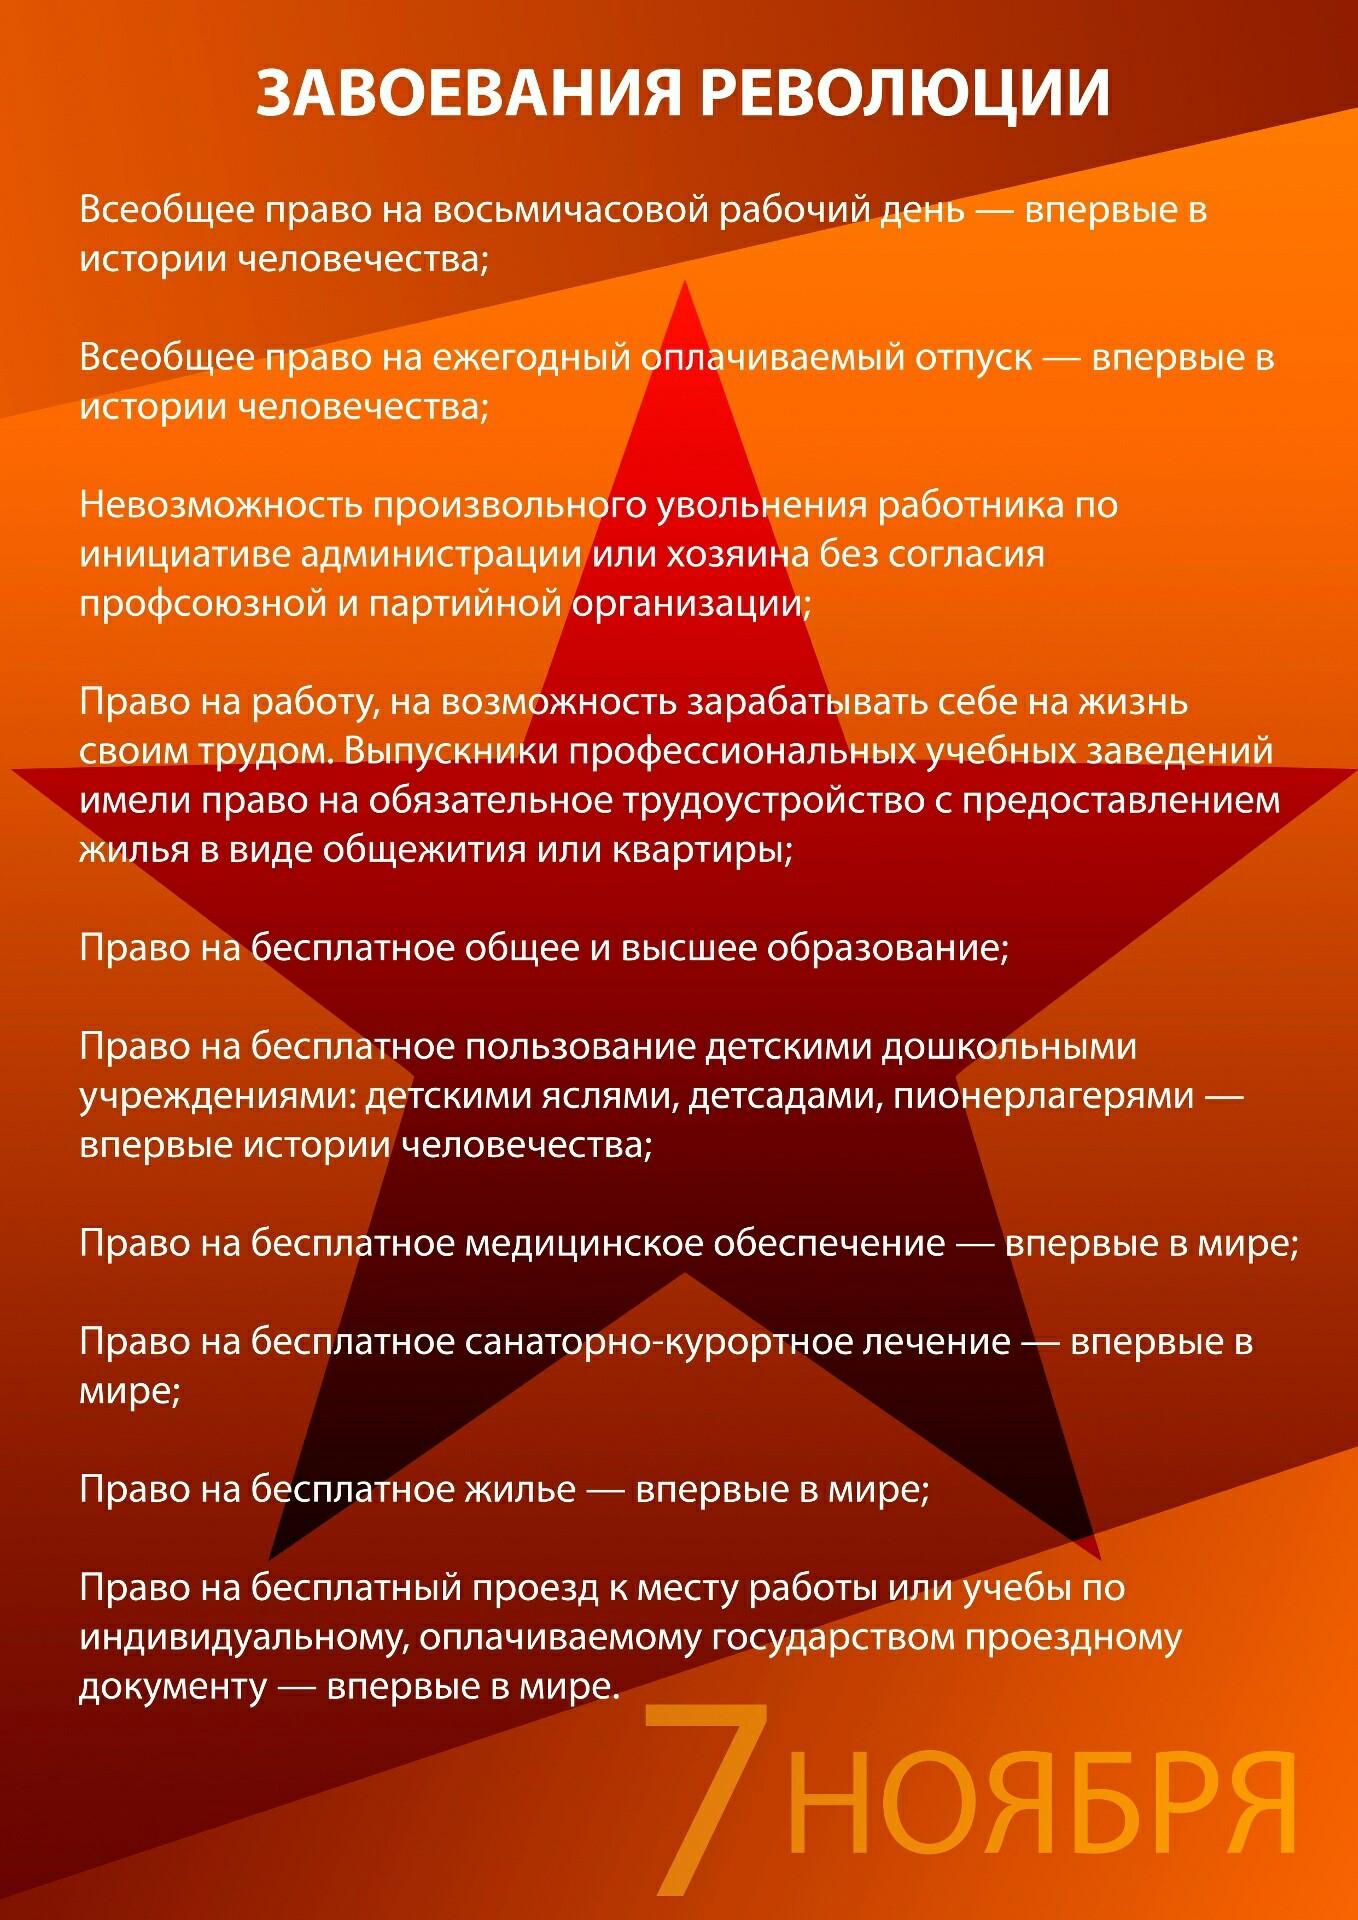 https://pp.userapi.com/c850524/v850524551/3bf4c/ubToC2qDD98.jpg